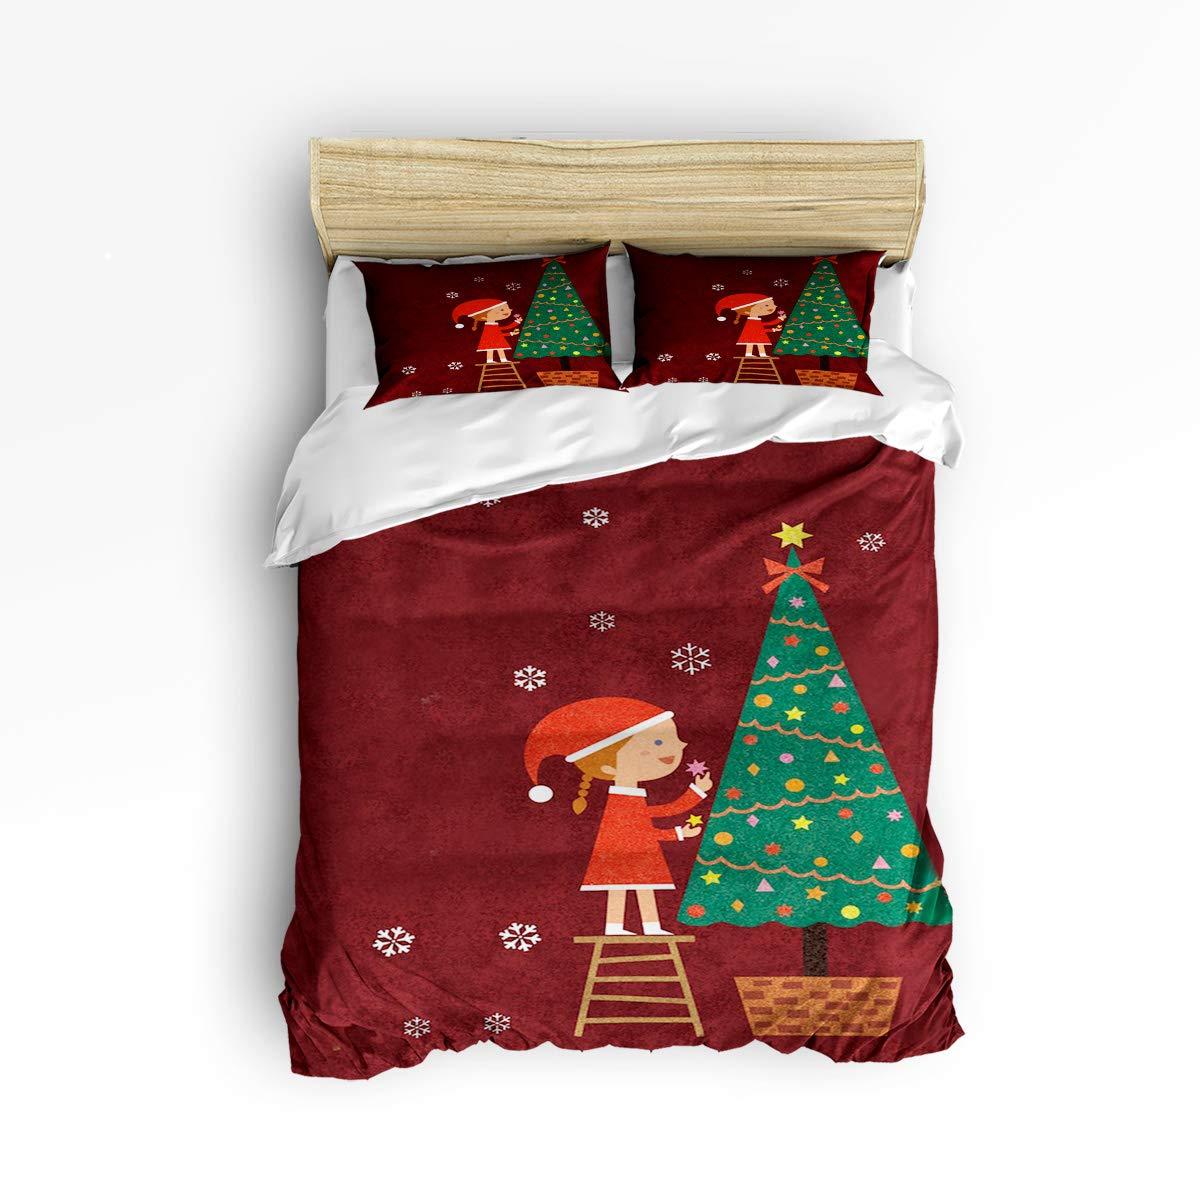 NewThangKa 3ピース寝具セット – ソフトダウン掛け布団キルト寝具カバー1枚 お揃いの枕カバー2枚 ファスナー開閉 クリスマスカートゥーンペインティング寝具布団カバーセット Twin Size WSJ-181122-3pcsets-SWTQ00411SJSANTK B07L86Q1FB Christmastree4ntk6274 Twin Size